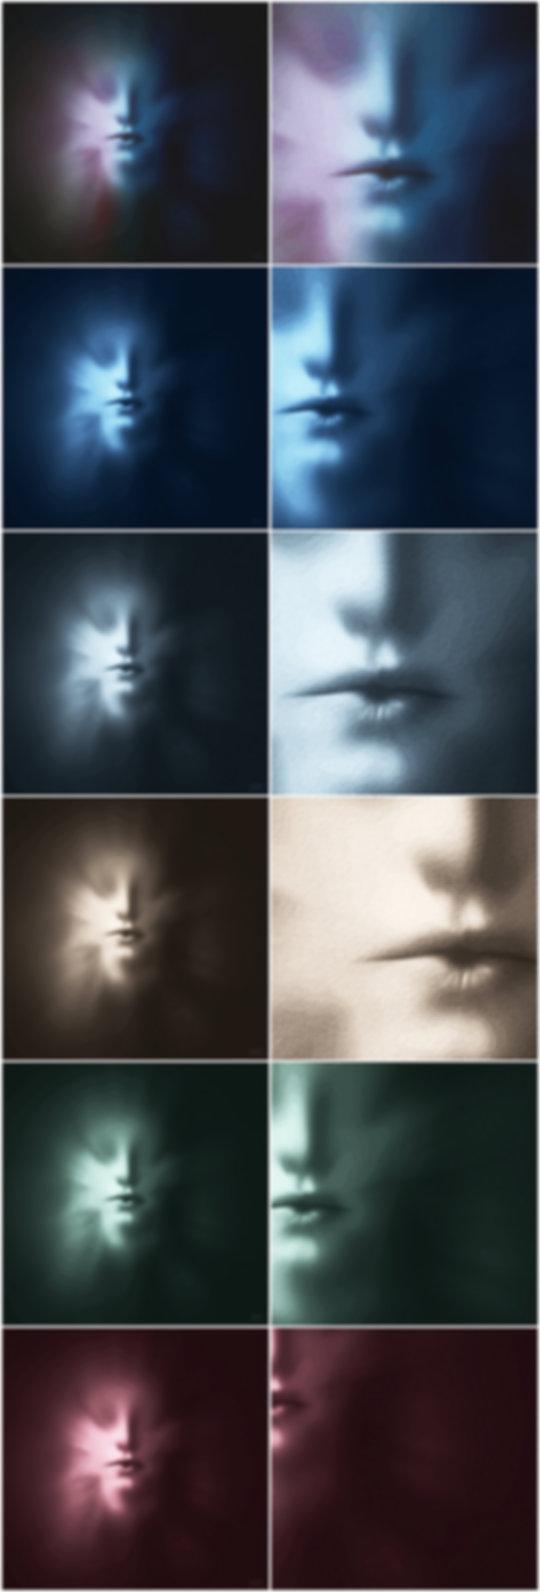 Conscious Breath 2b2b ORG COLLECTION 201